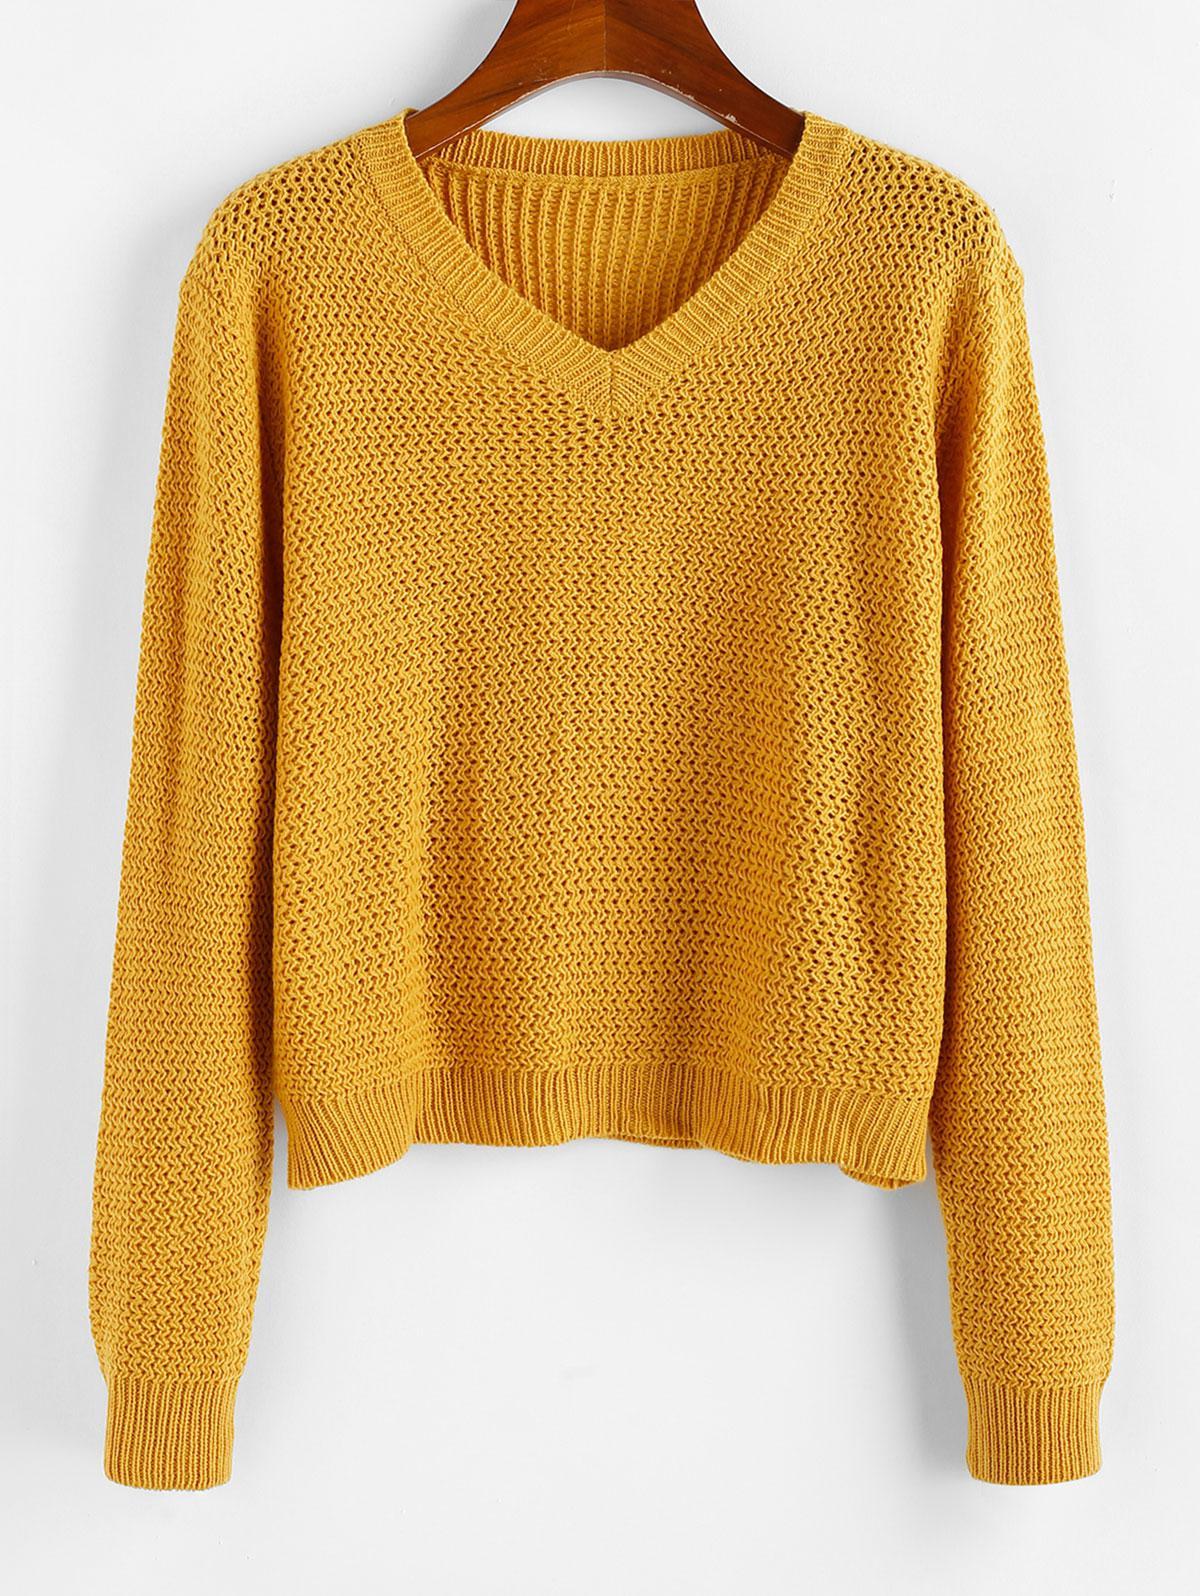 ZAFUL V Neck Plain Jumper Sweater